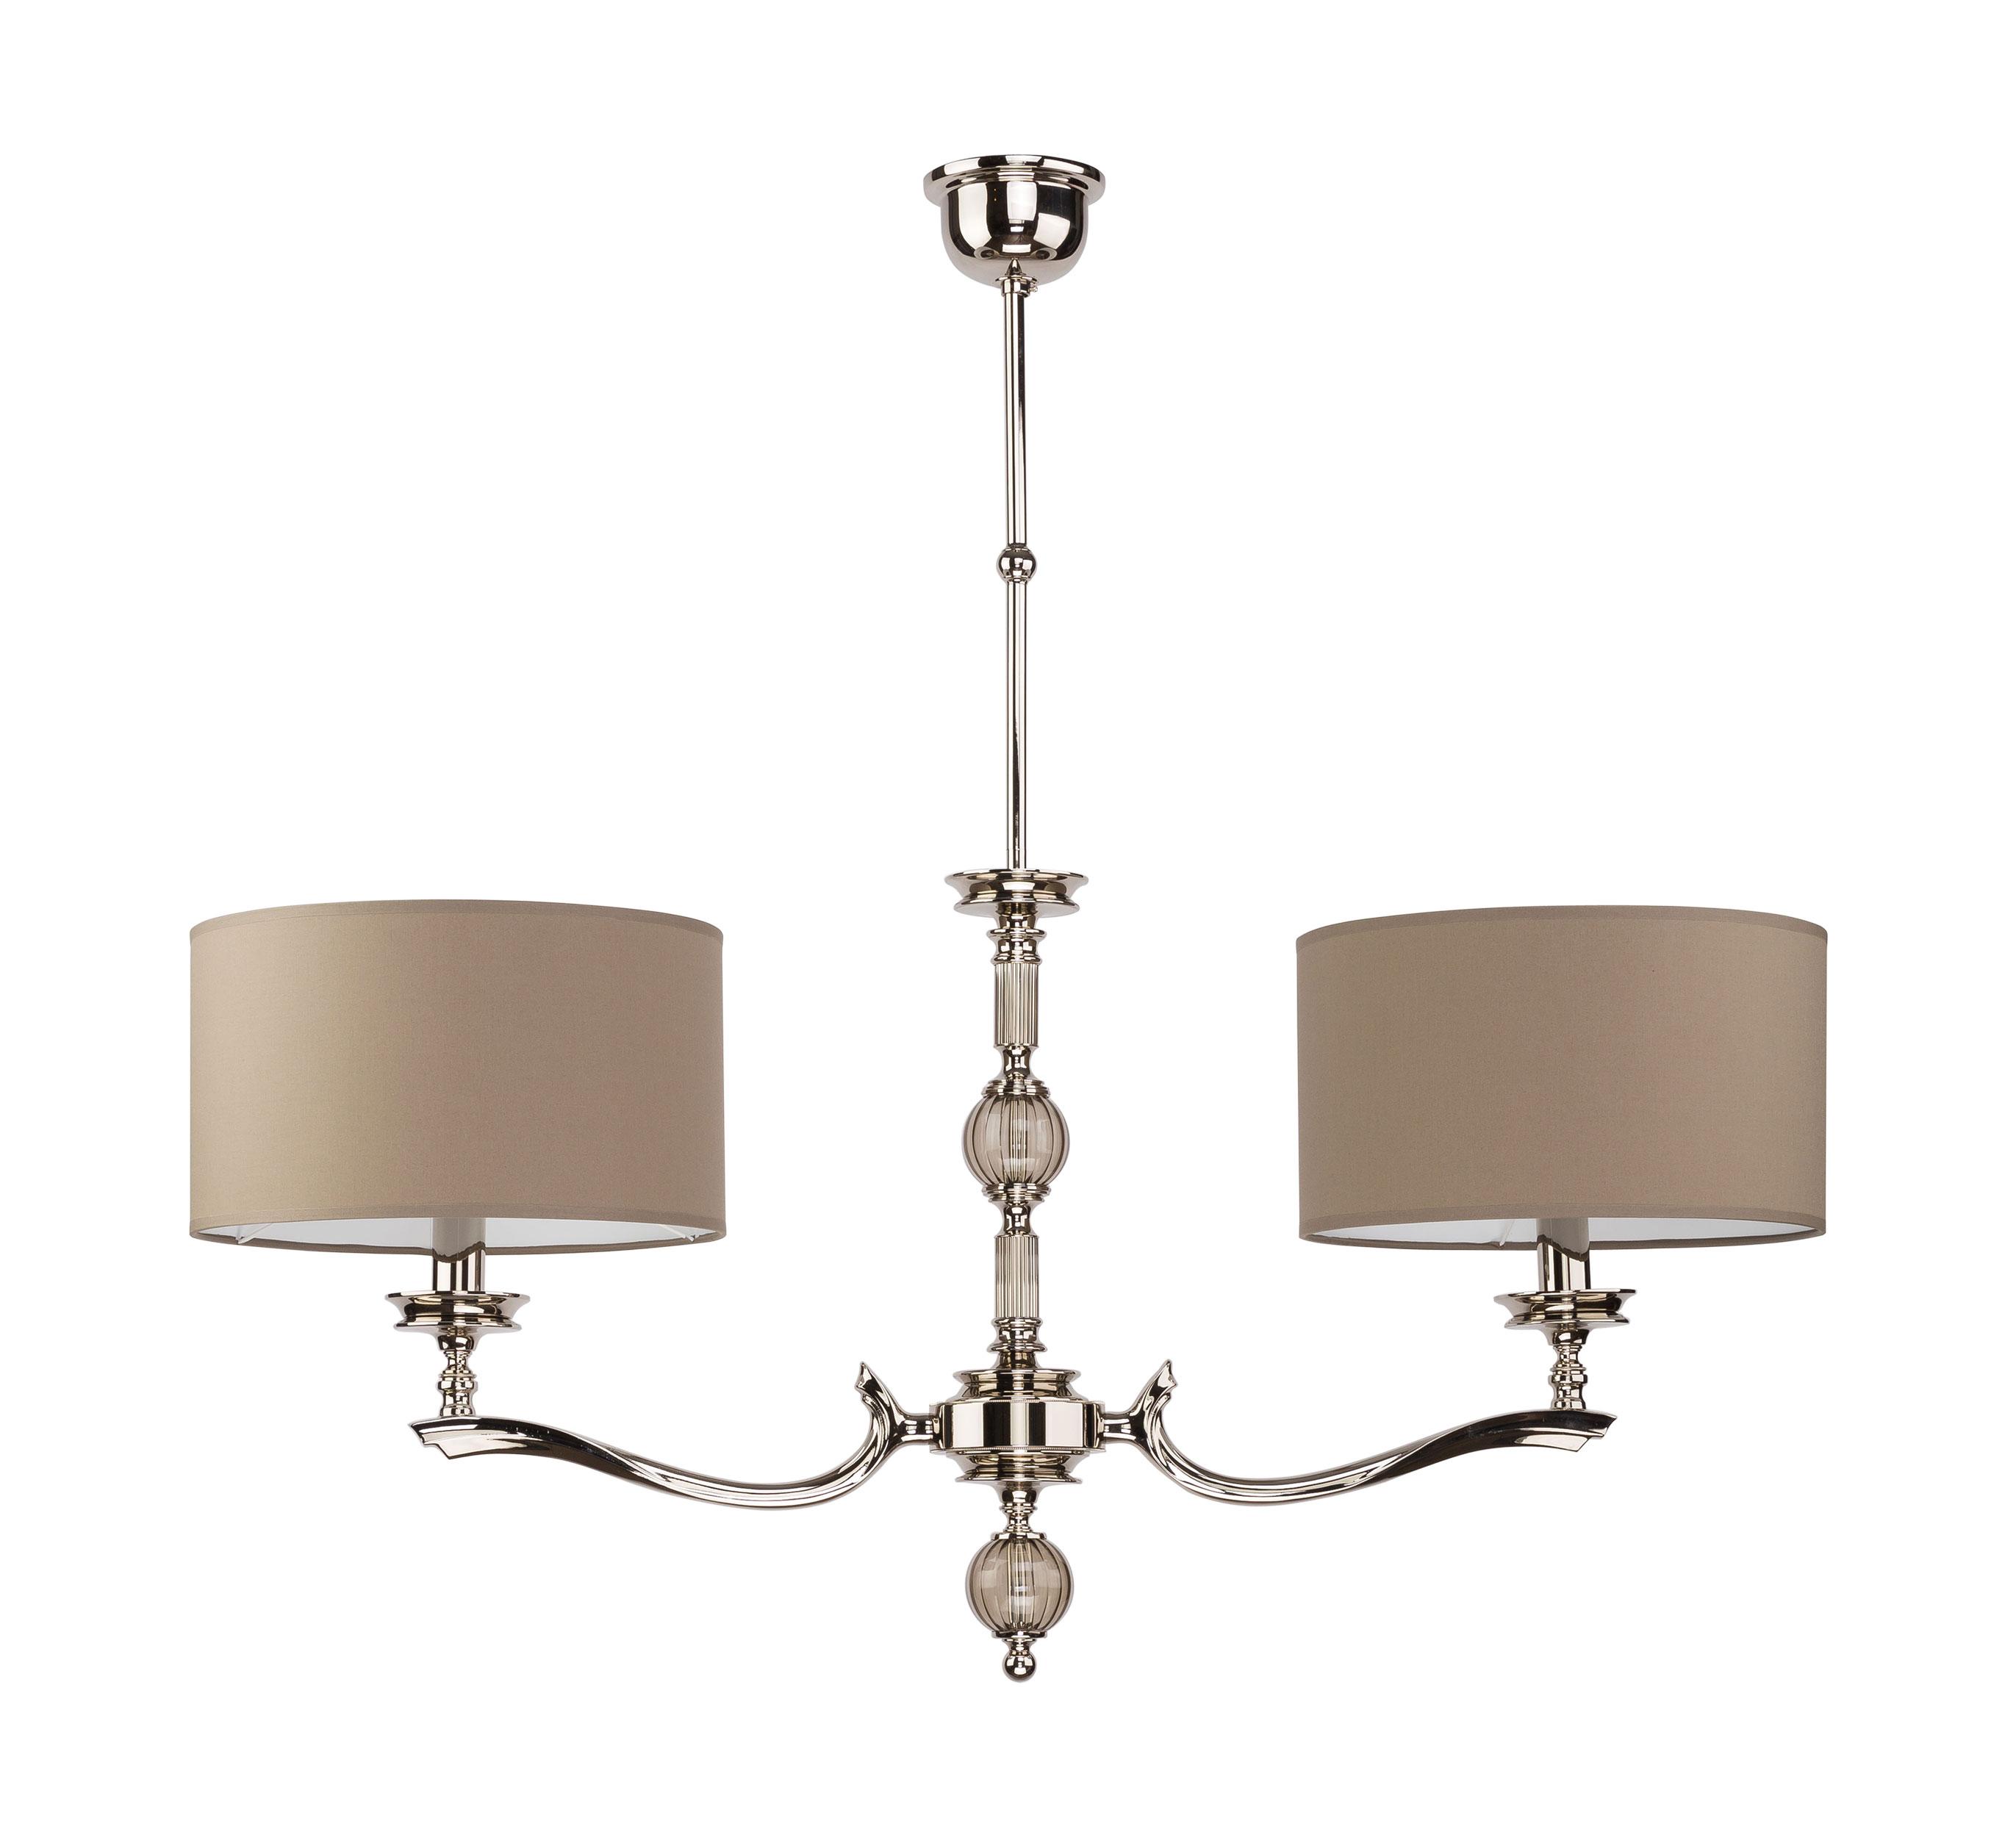 Tivoli Brass Chandelier 2 Arms Fabric Lampshades Glass Pendant Light